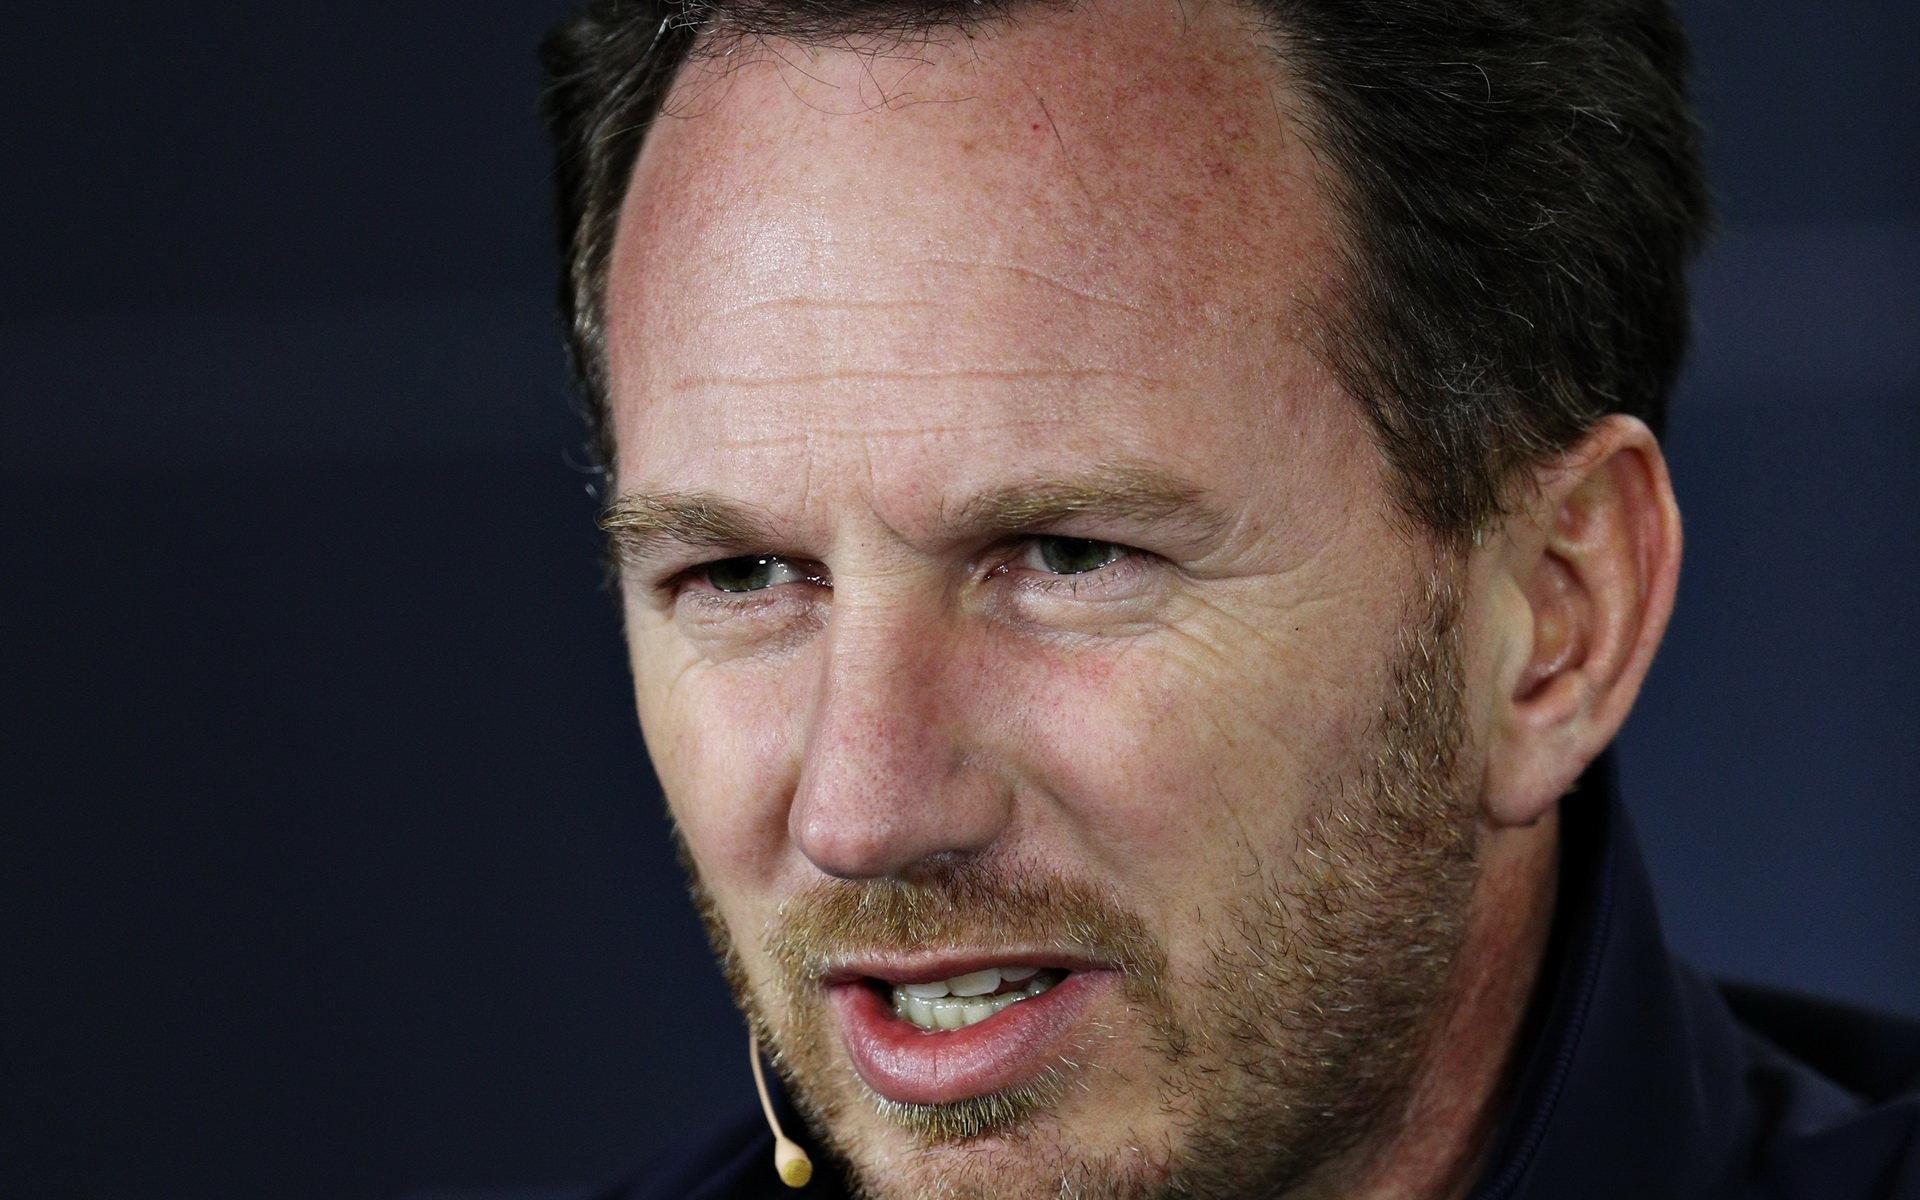 Šéf Red Bullu Christian Horner